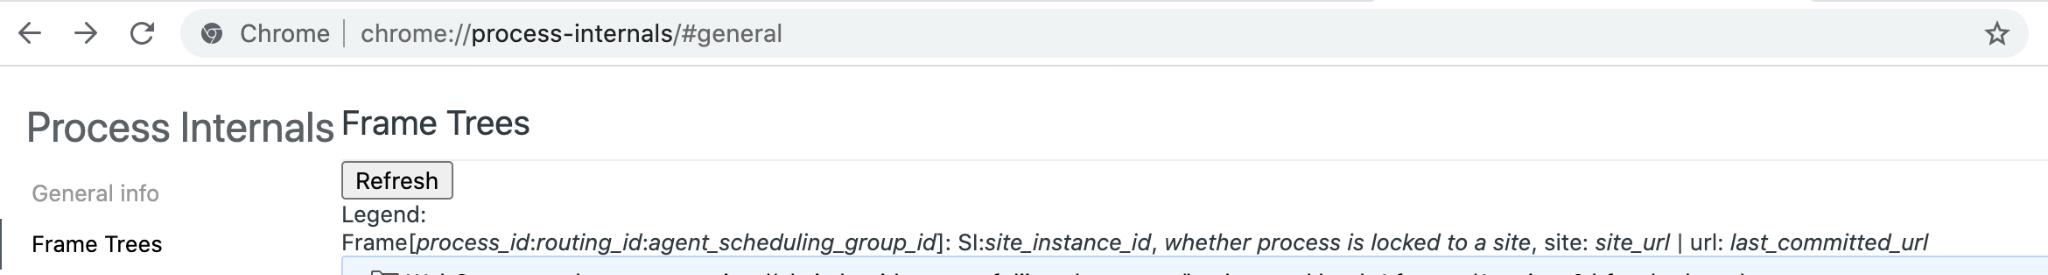 Process internals page.